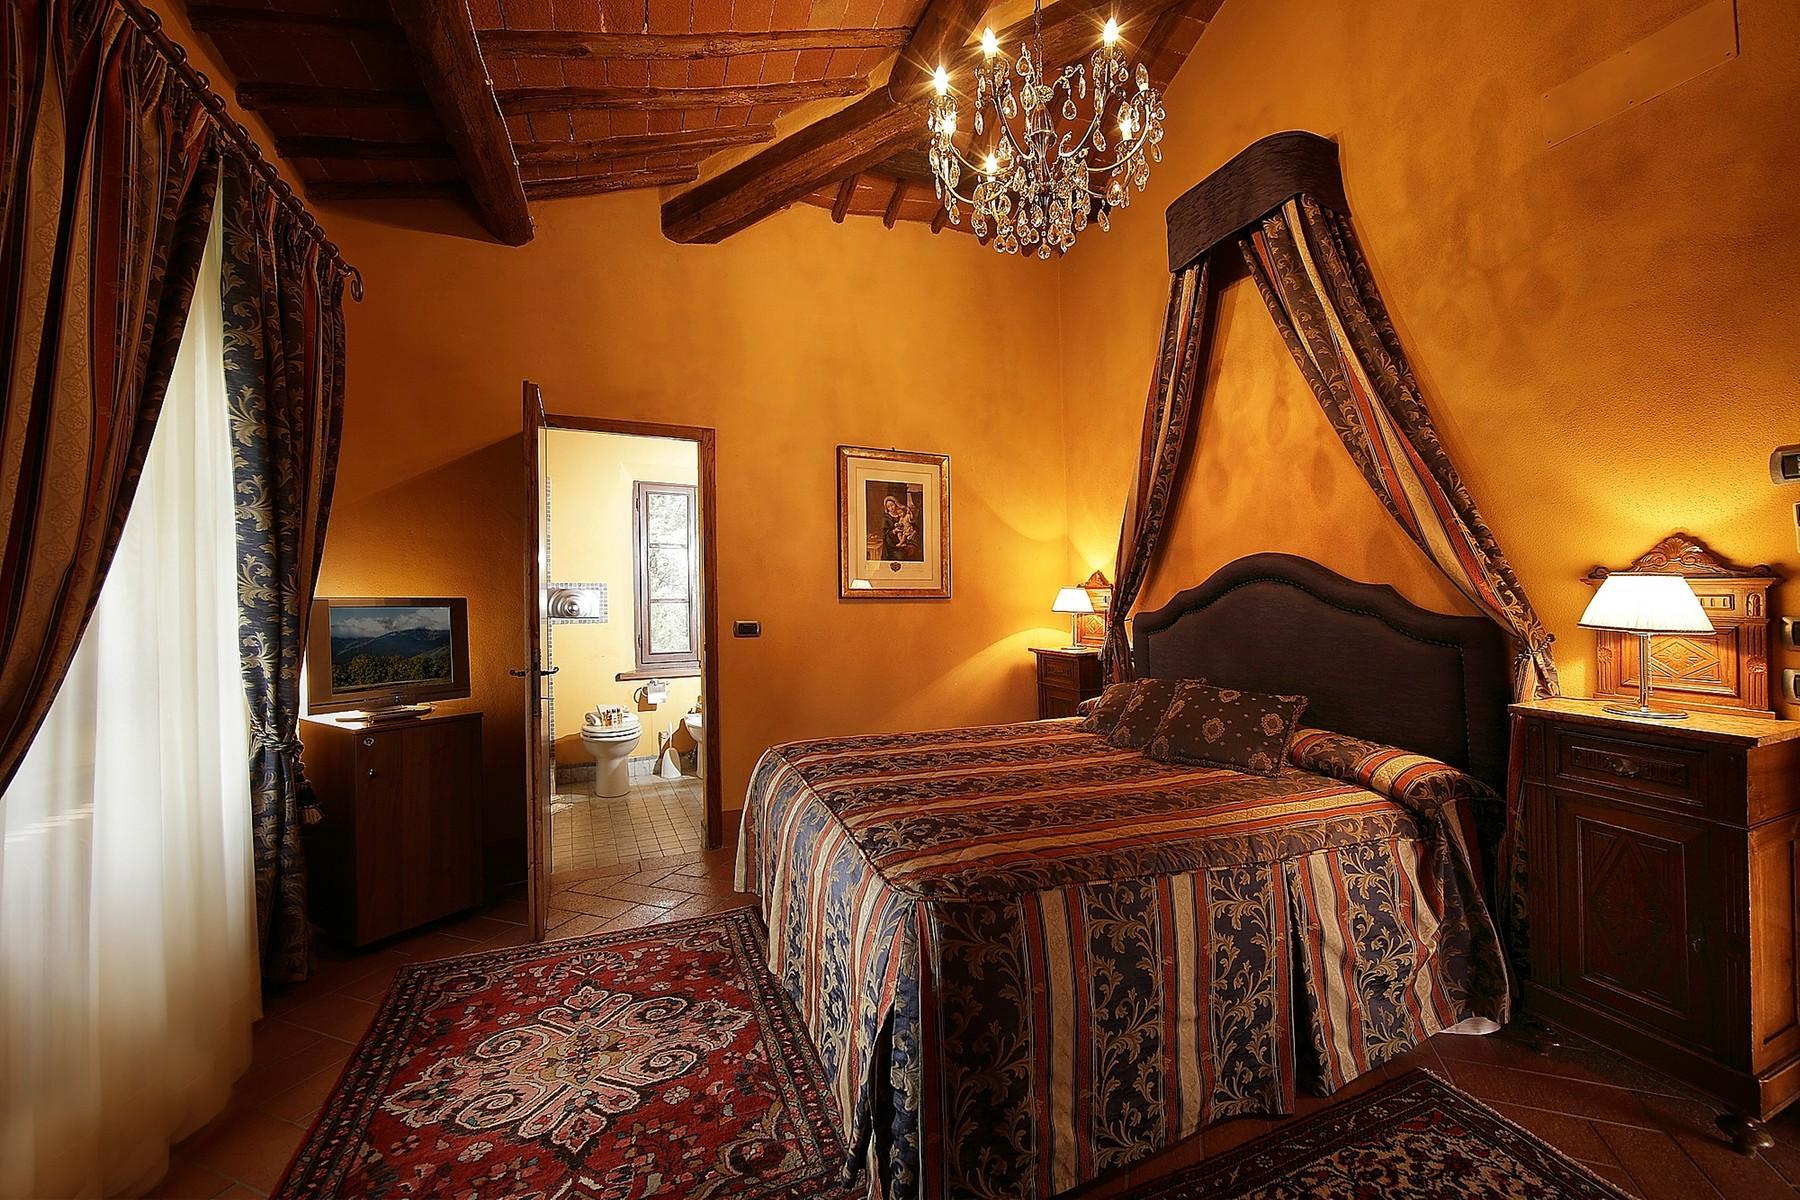 Exclusive manor in the heart of Chianti Classico - 15